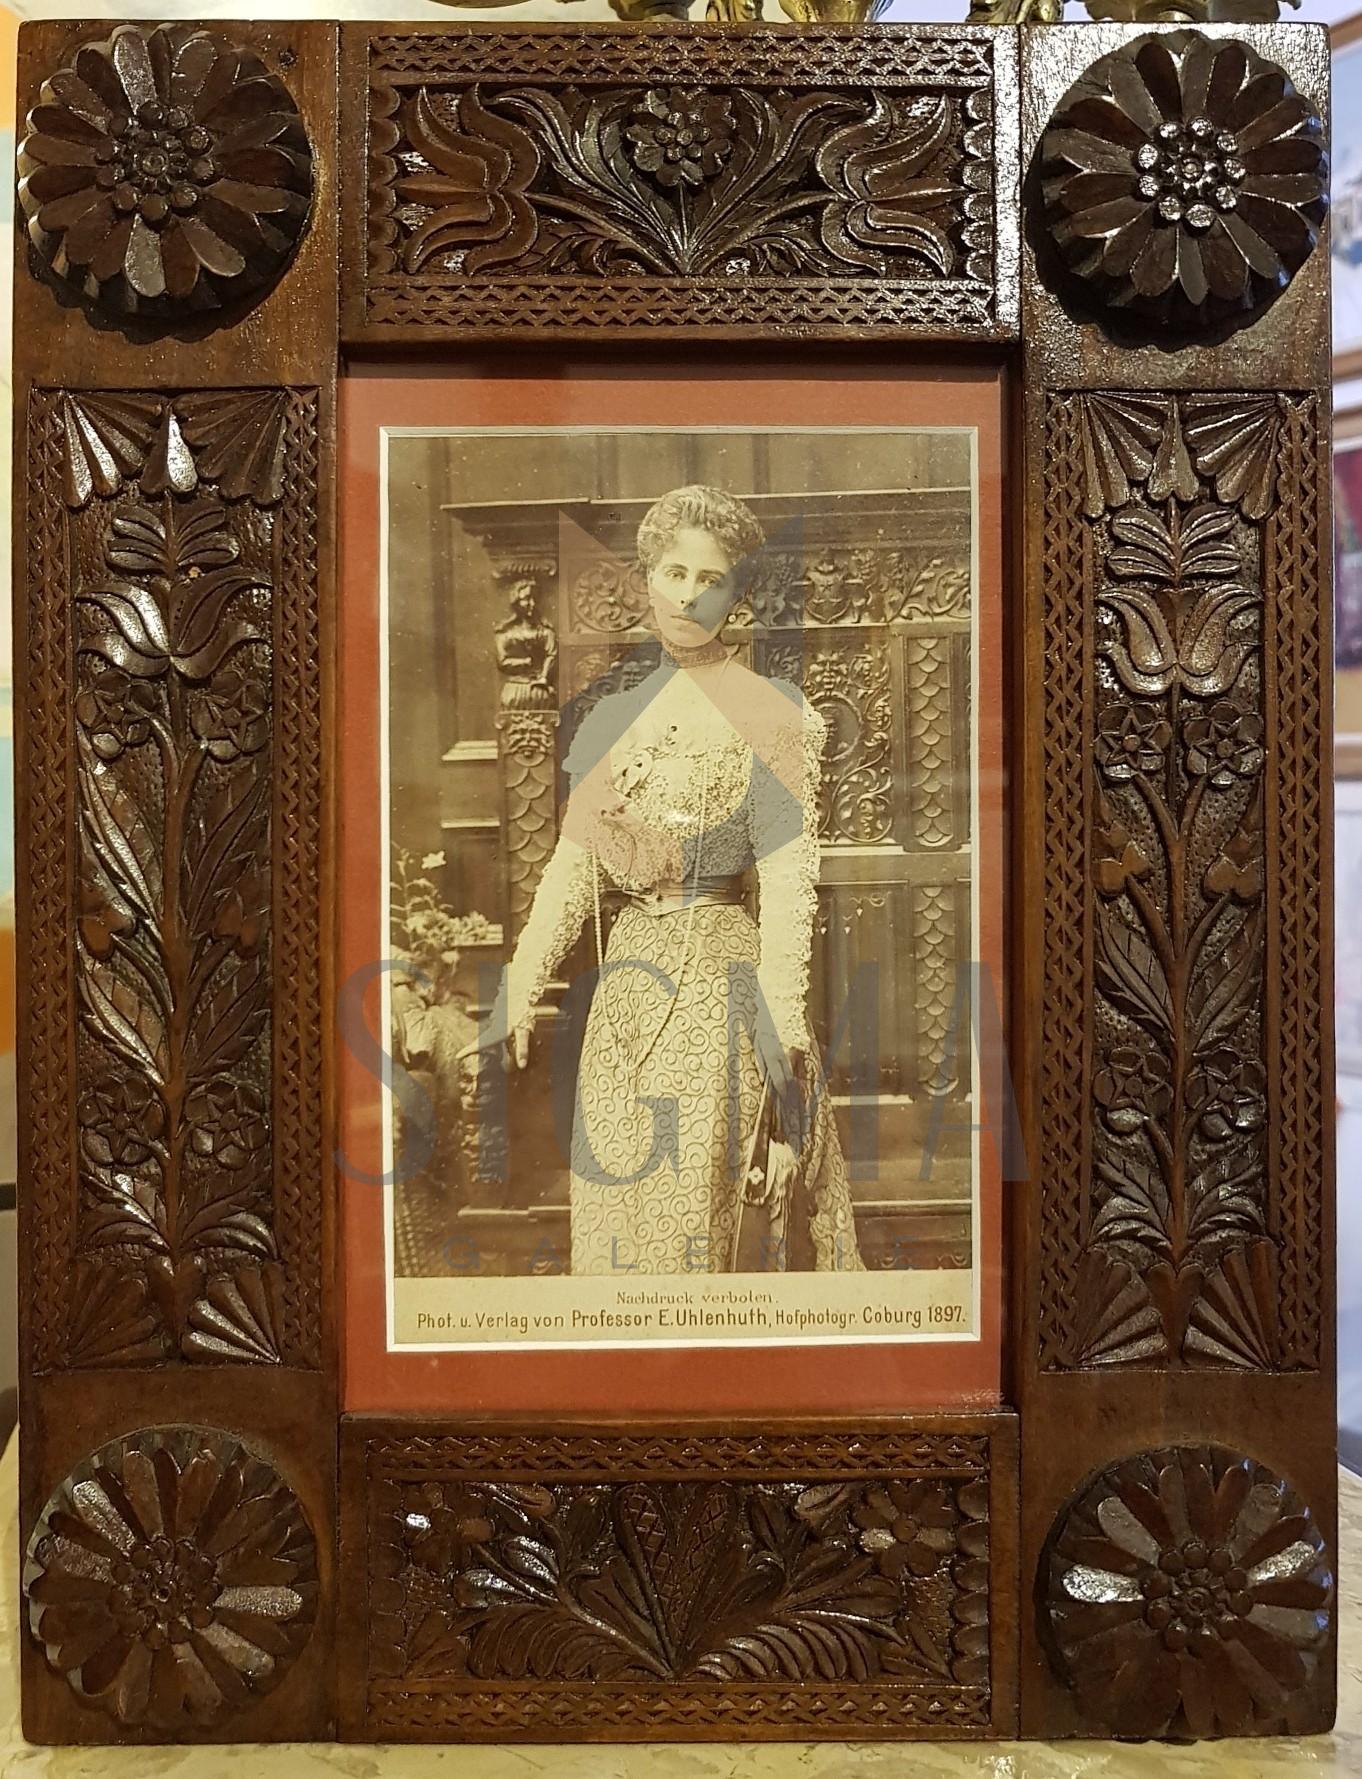 REGINA MARIA A ROMANIEI, FOTOGRAFIE DE CABINET ORIGINALA IN RAMA NEOBRANCOVENEASCA, 1897